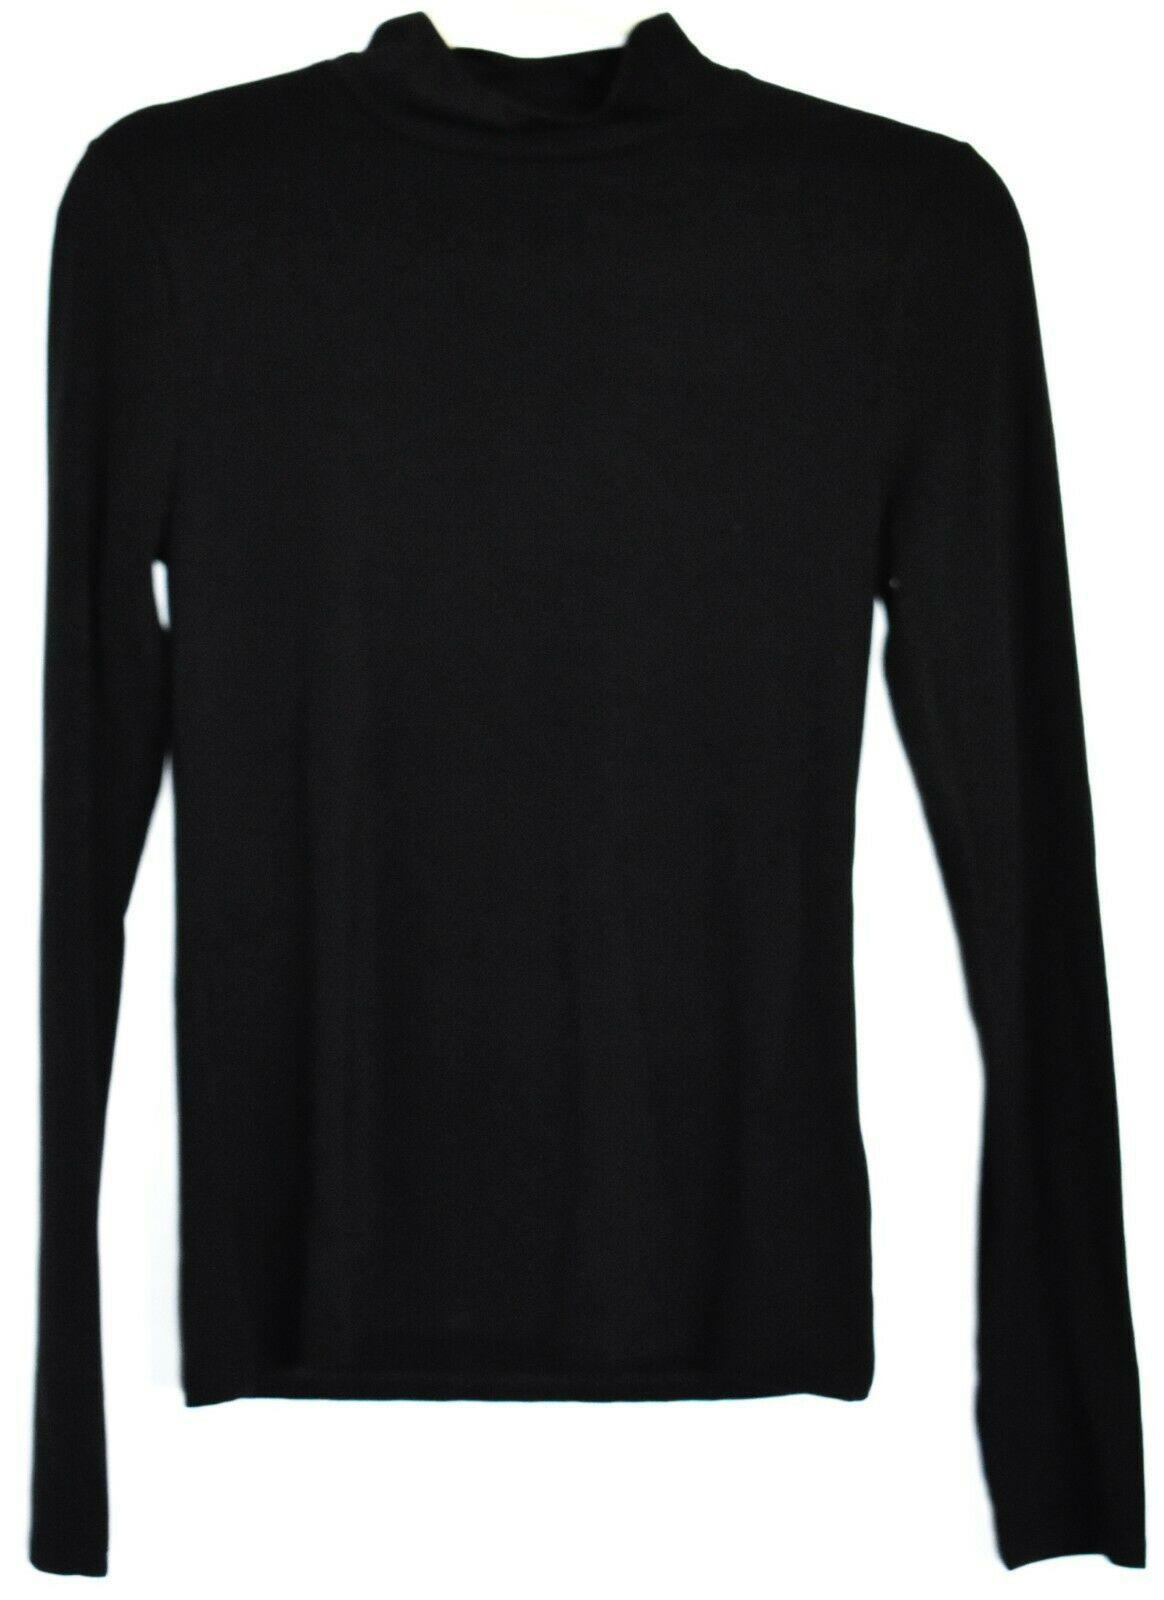 Forever 21 Solid Black Long Sleeve Mock Neck Plain Shirt Top Size M